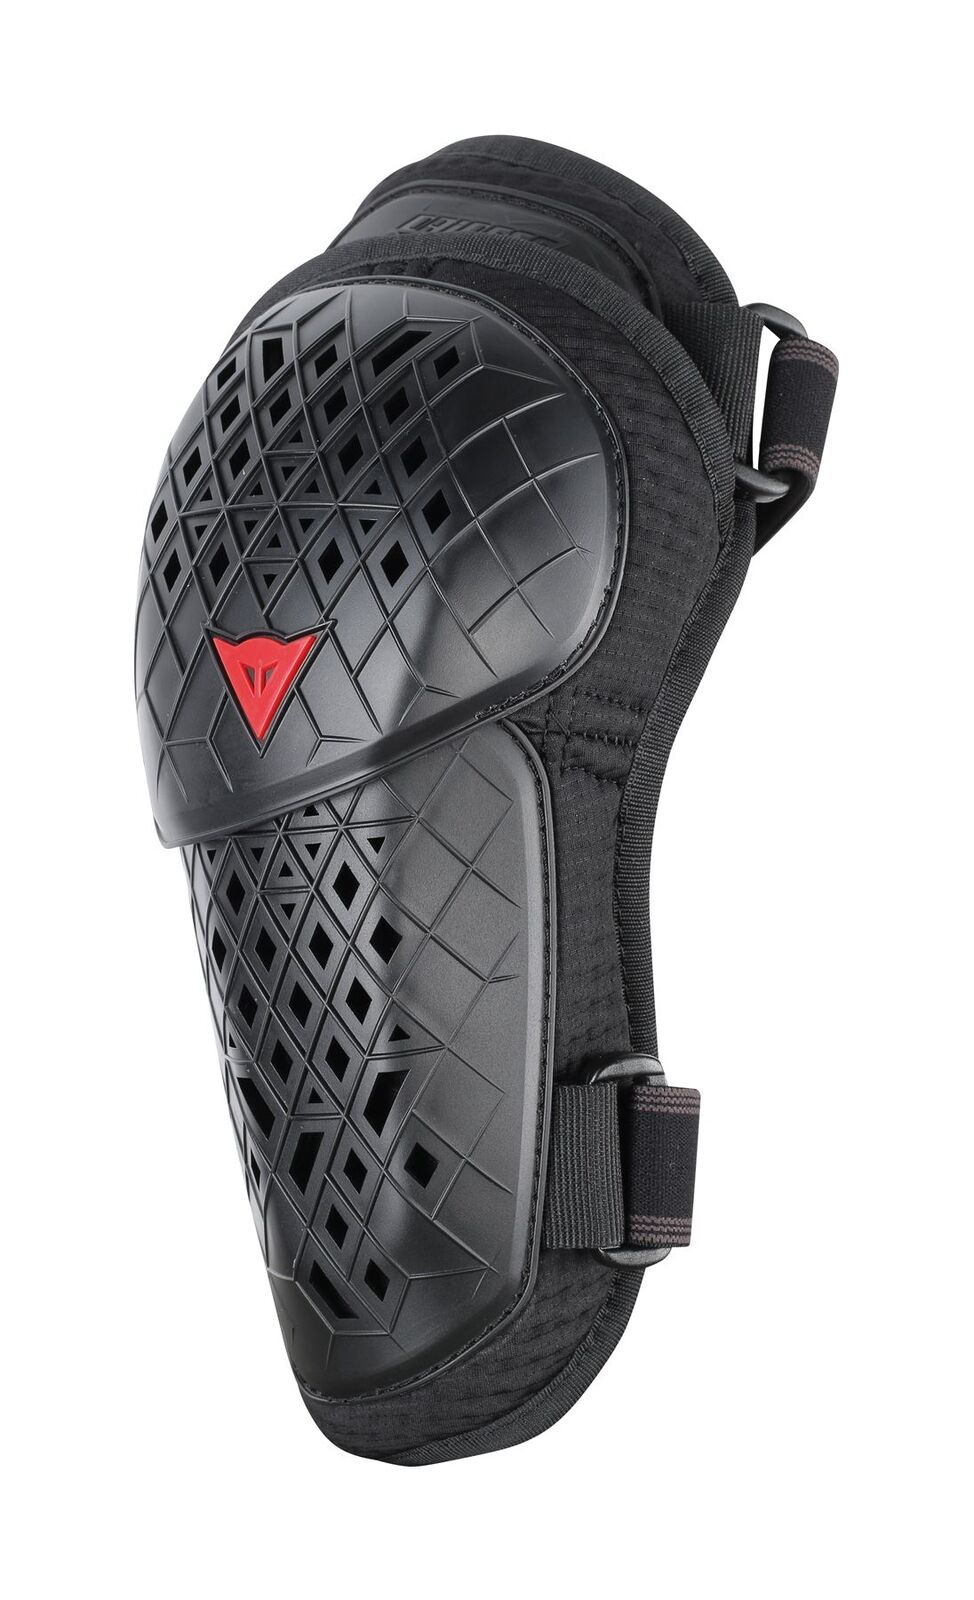 Armoform Safety Elbow Guard Lite With Polypropylene elbow & Forearm Plates (L)